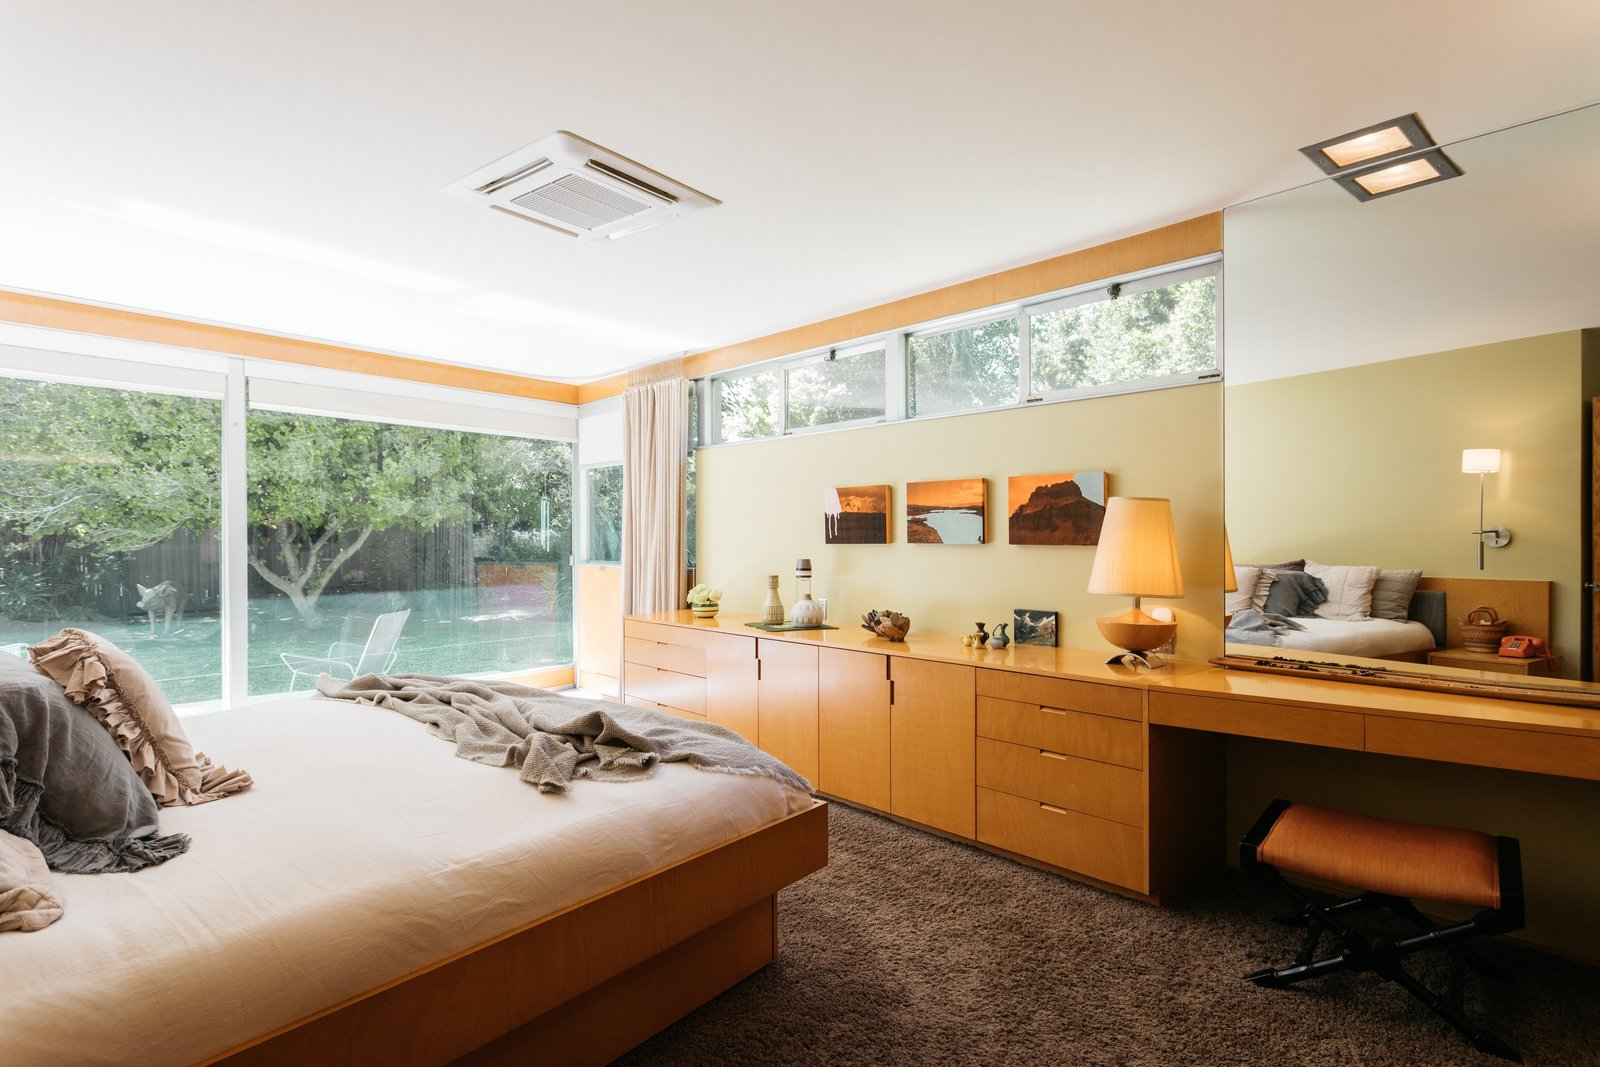 Richard Neutra Wilkins House Case Study House #13  master bedroom